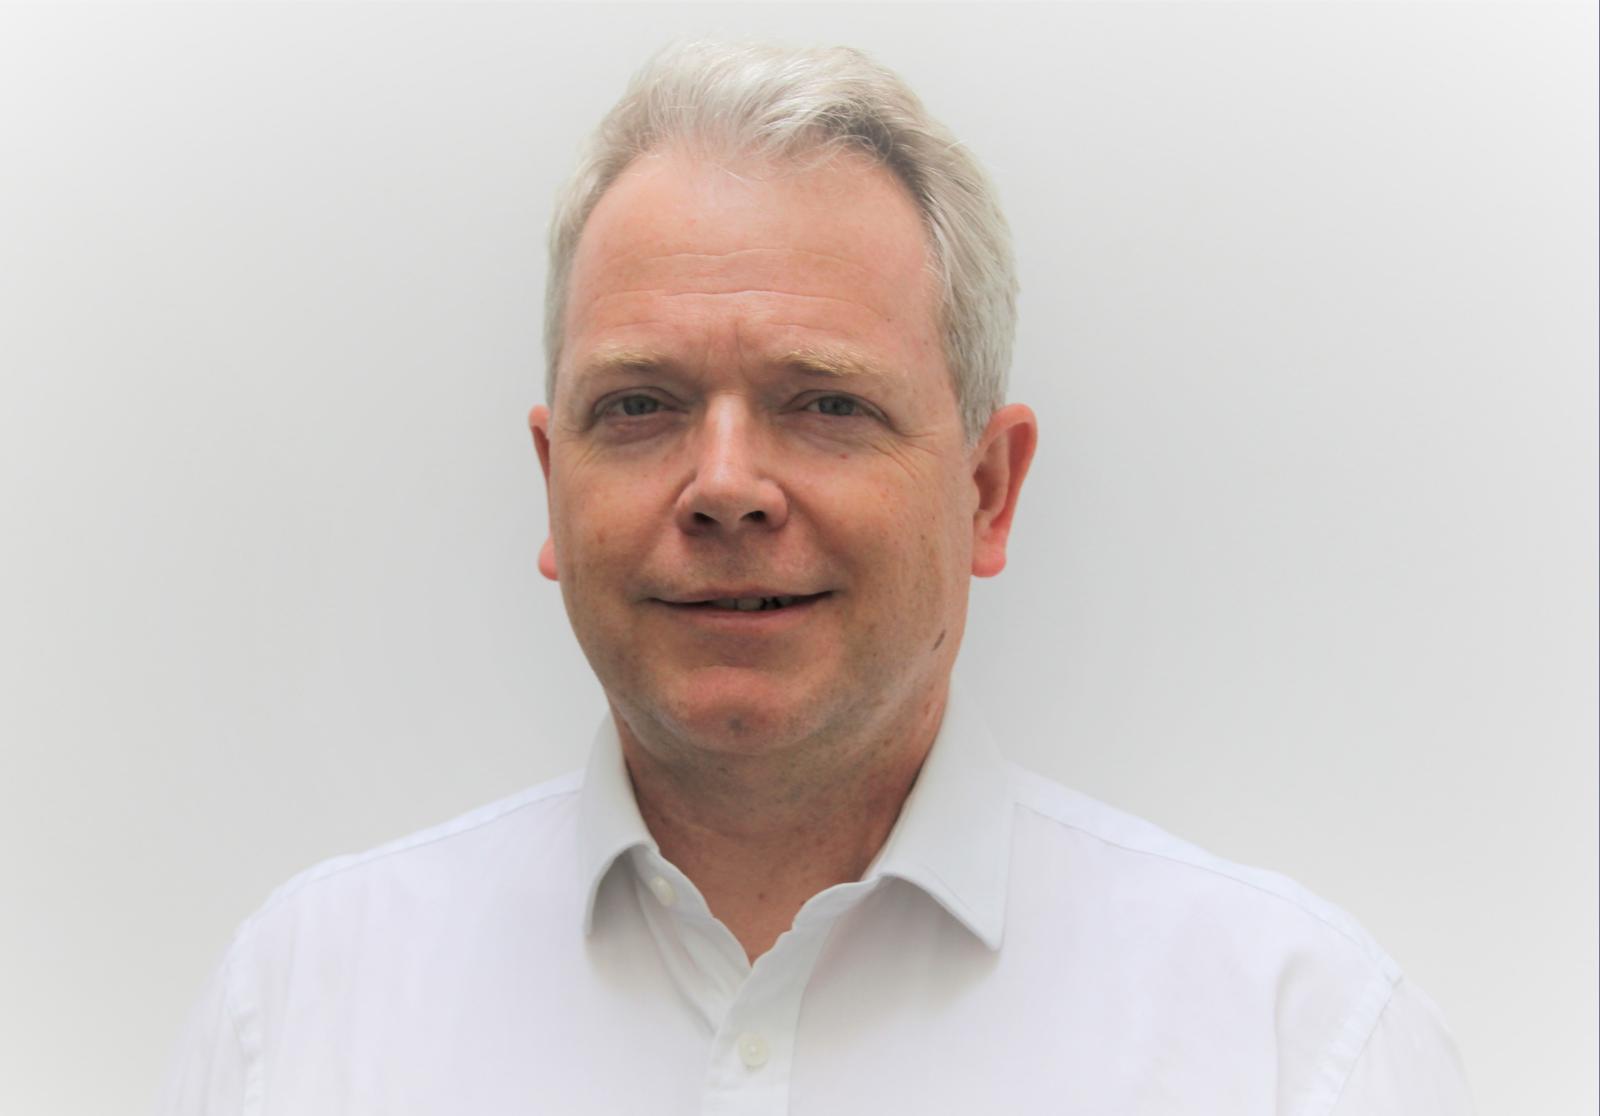 Checkmate CEO John Lewthwaite